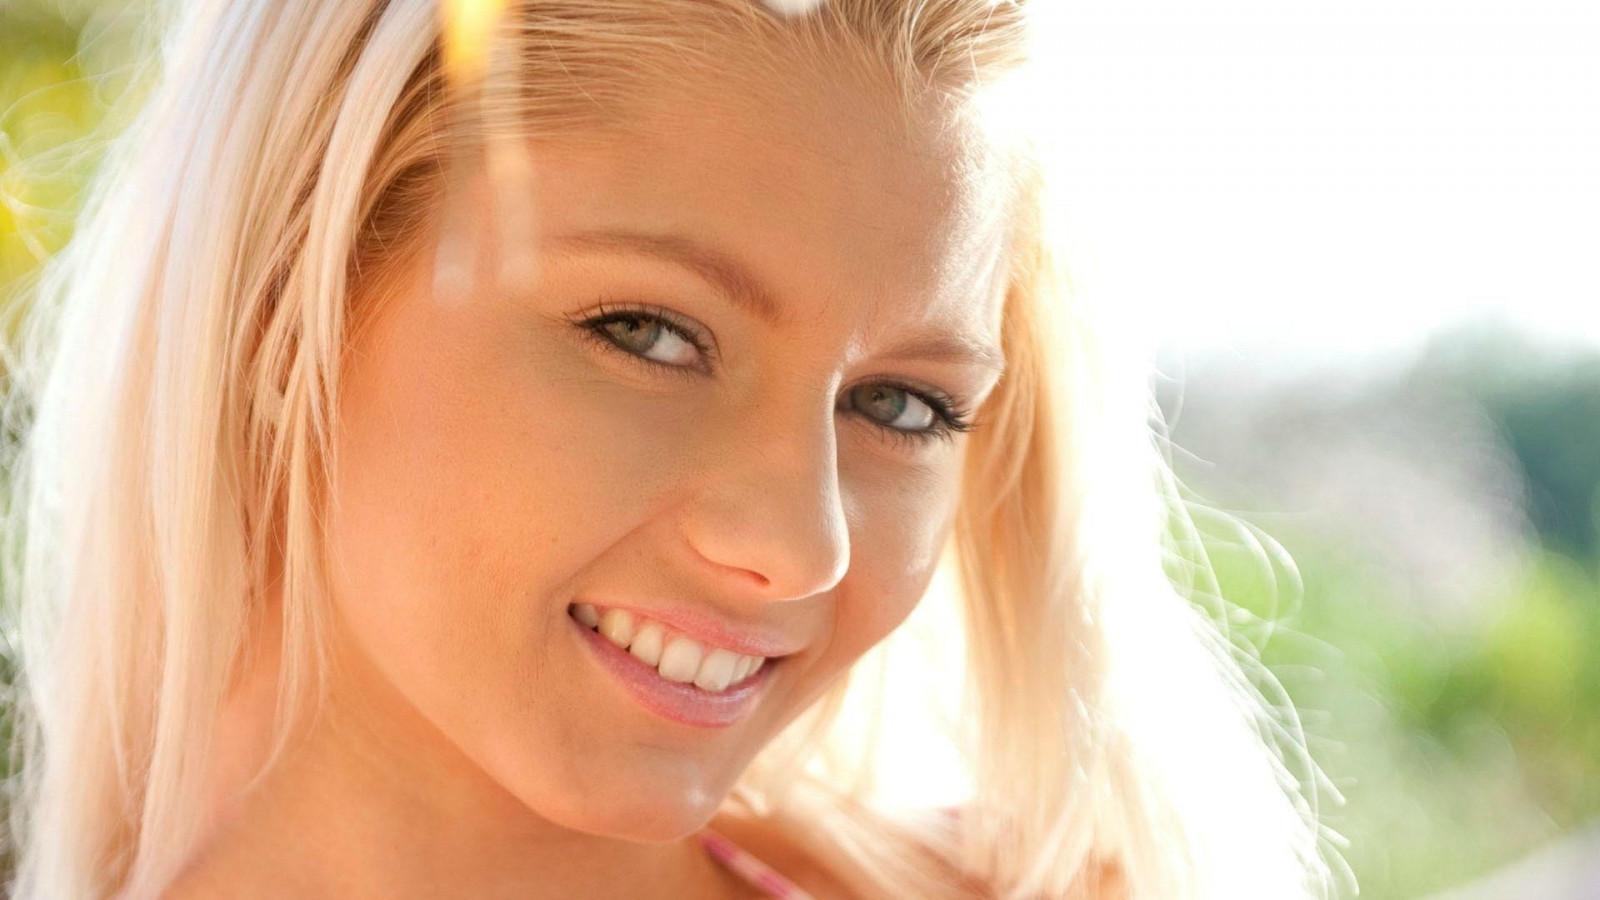 Wallpaper : face, women, model, blonde, long hair